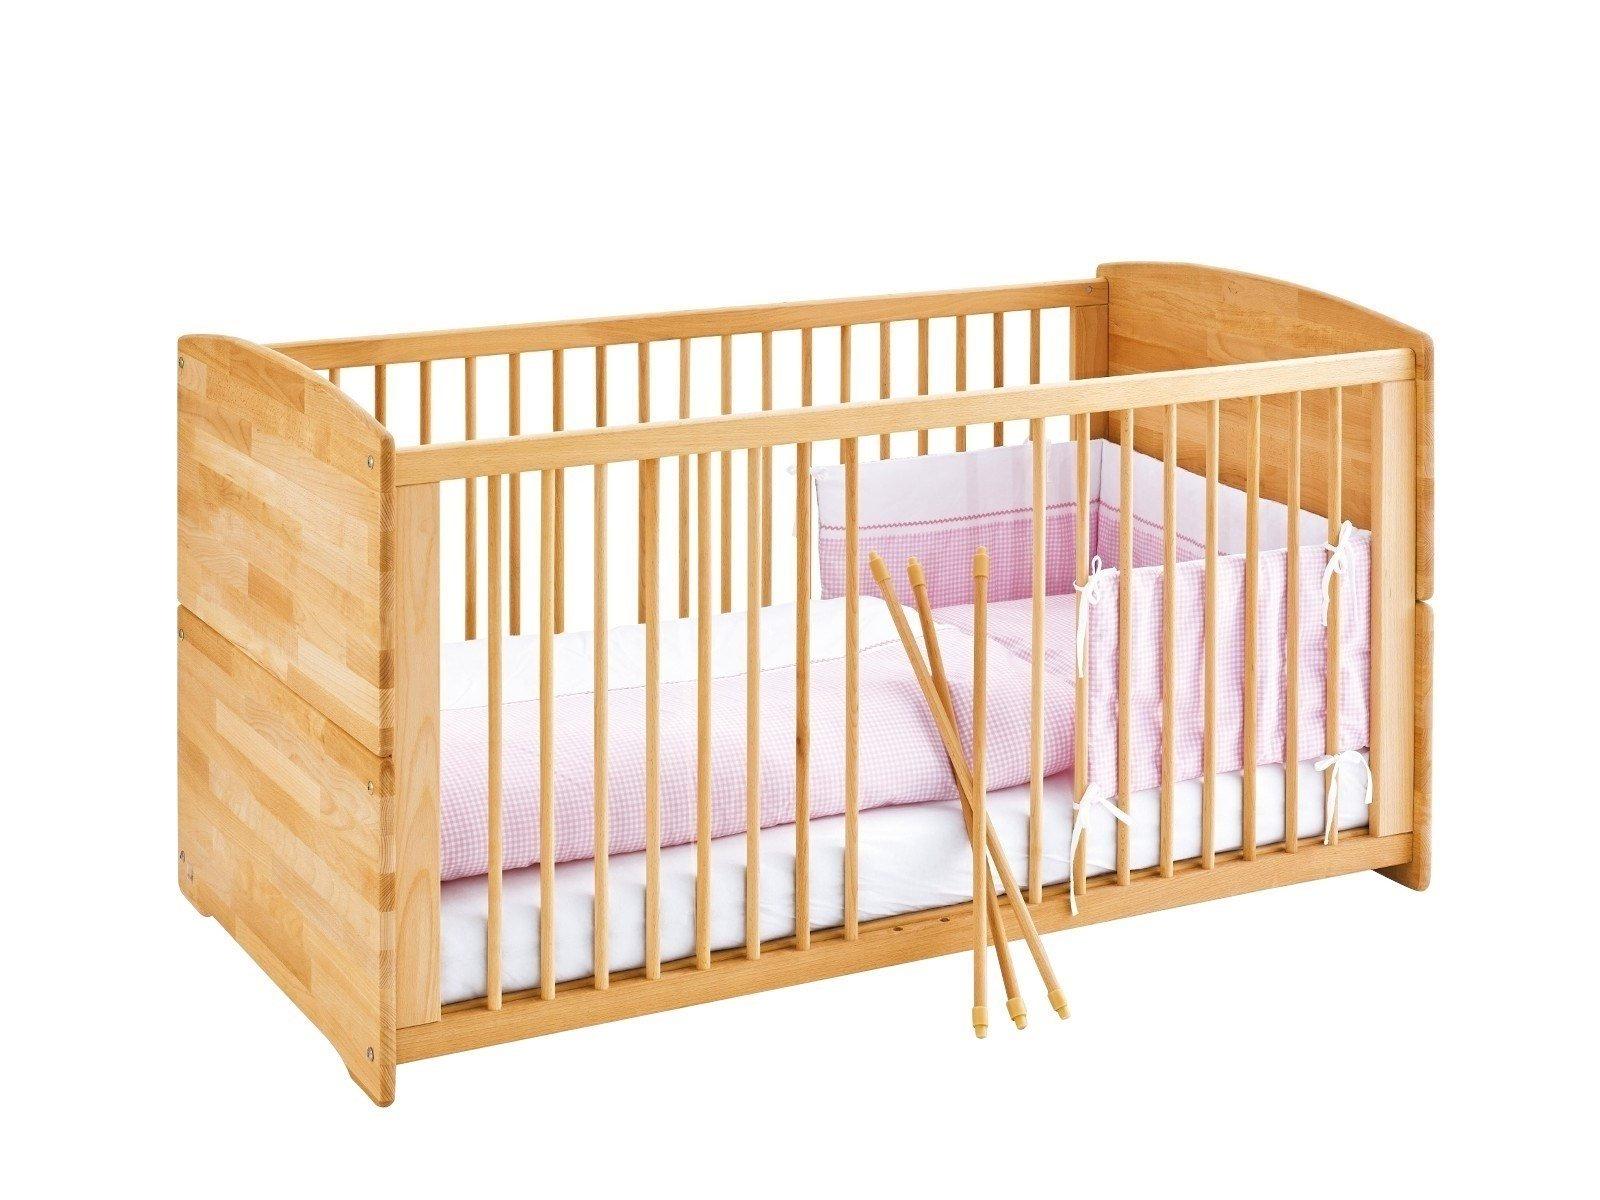 Full Size of Pinolino Kinderbett Ole Bett 2x2m Ausziehbar Matratze 200x200 Komforthöhe 120x190 Mit Und Lattenrost Weiß 180x200 Baza Platzsparend Betten Für Bett Pinolino Bett